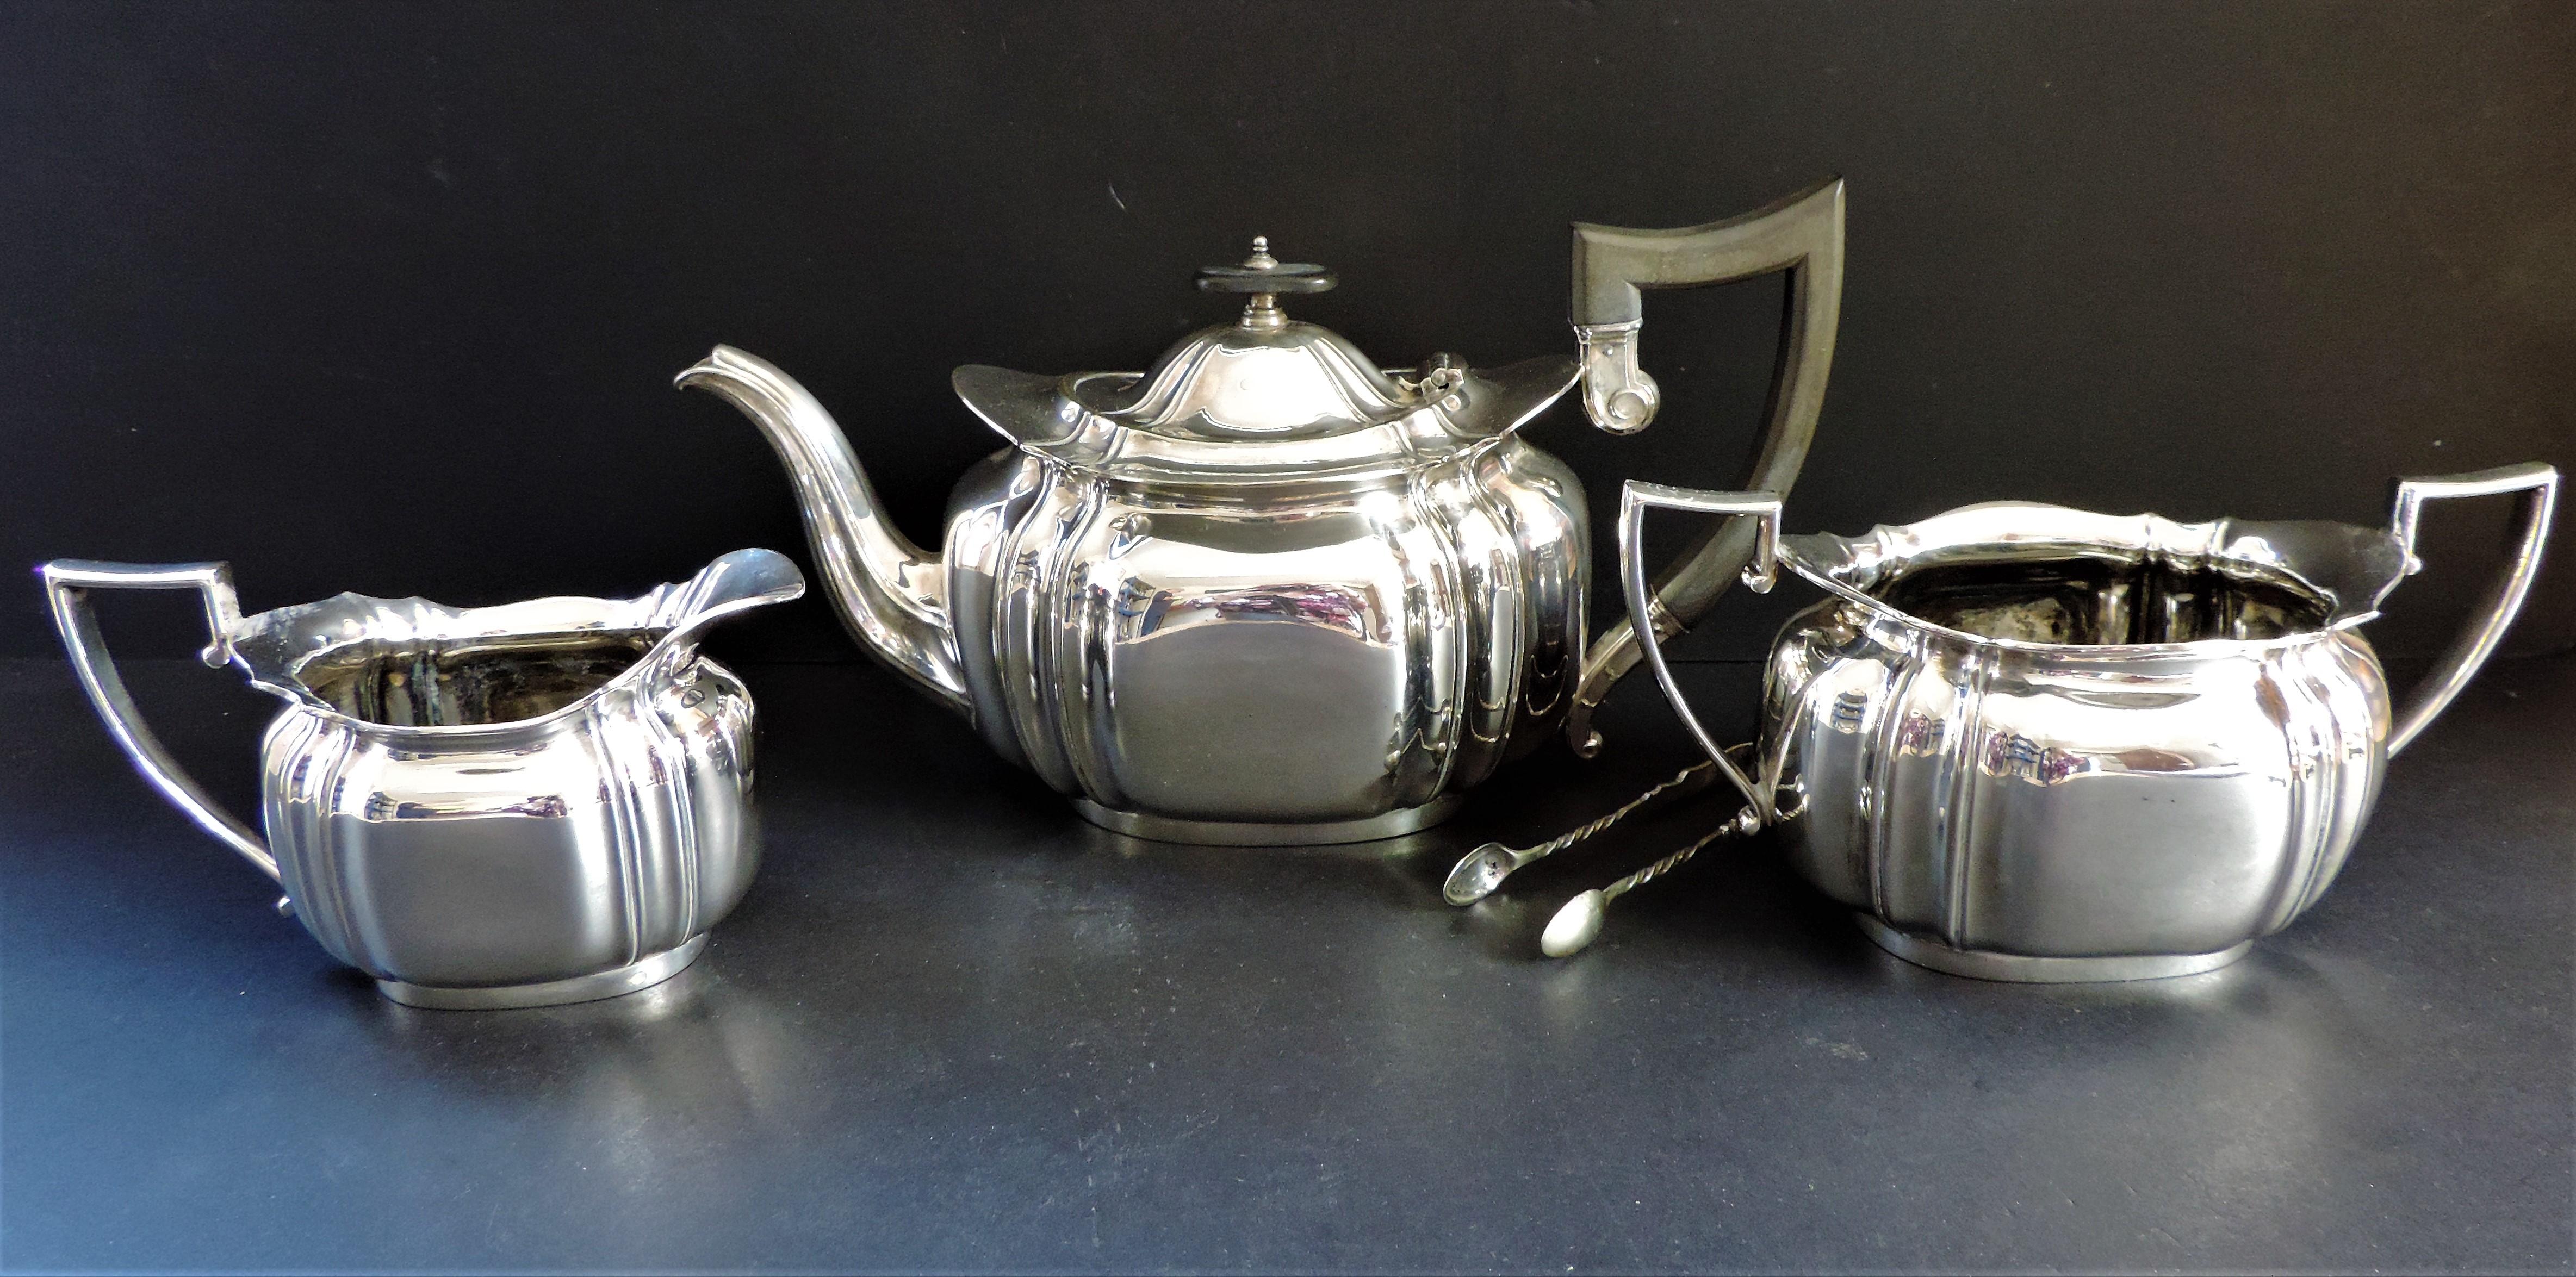 Antique Edwardian 4 Piece Silver Plated Tea Set circa 1900-1910